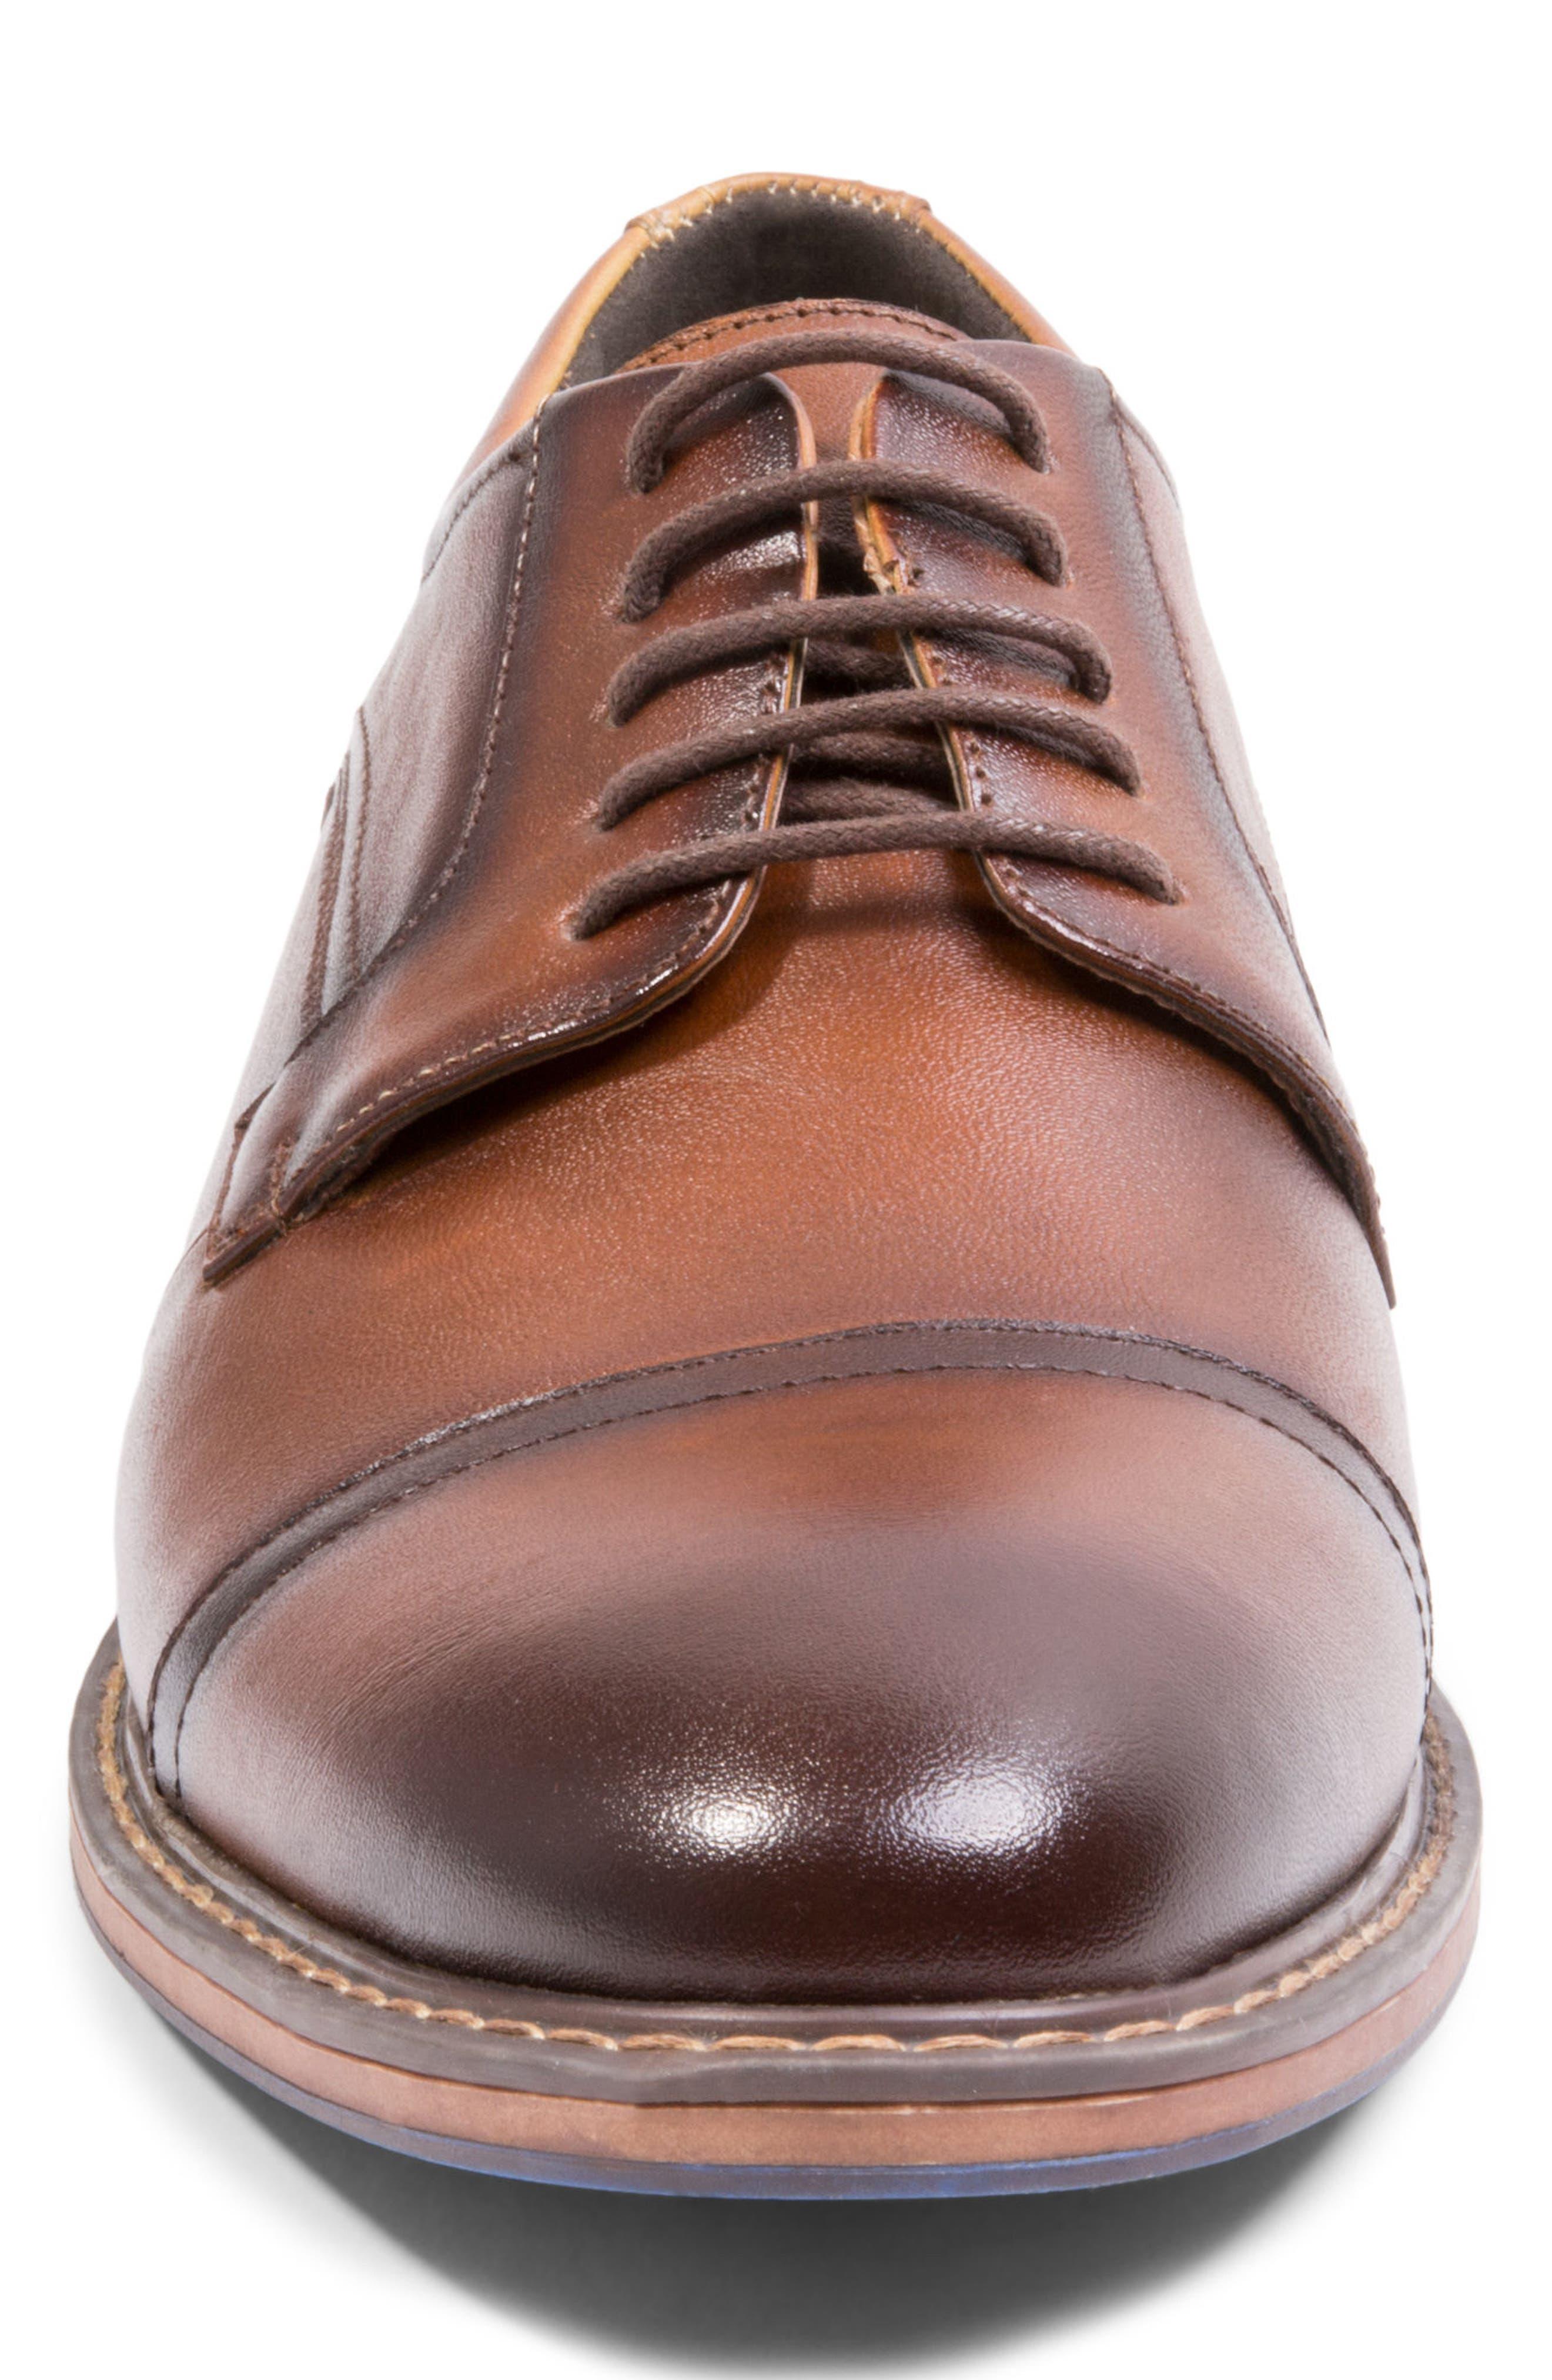 Averie Cap Toe Derby,                             Alternate thumbnail 4, color,                             Tan Leather